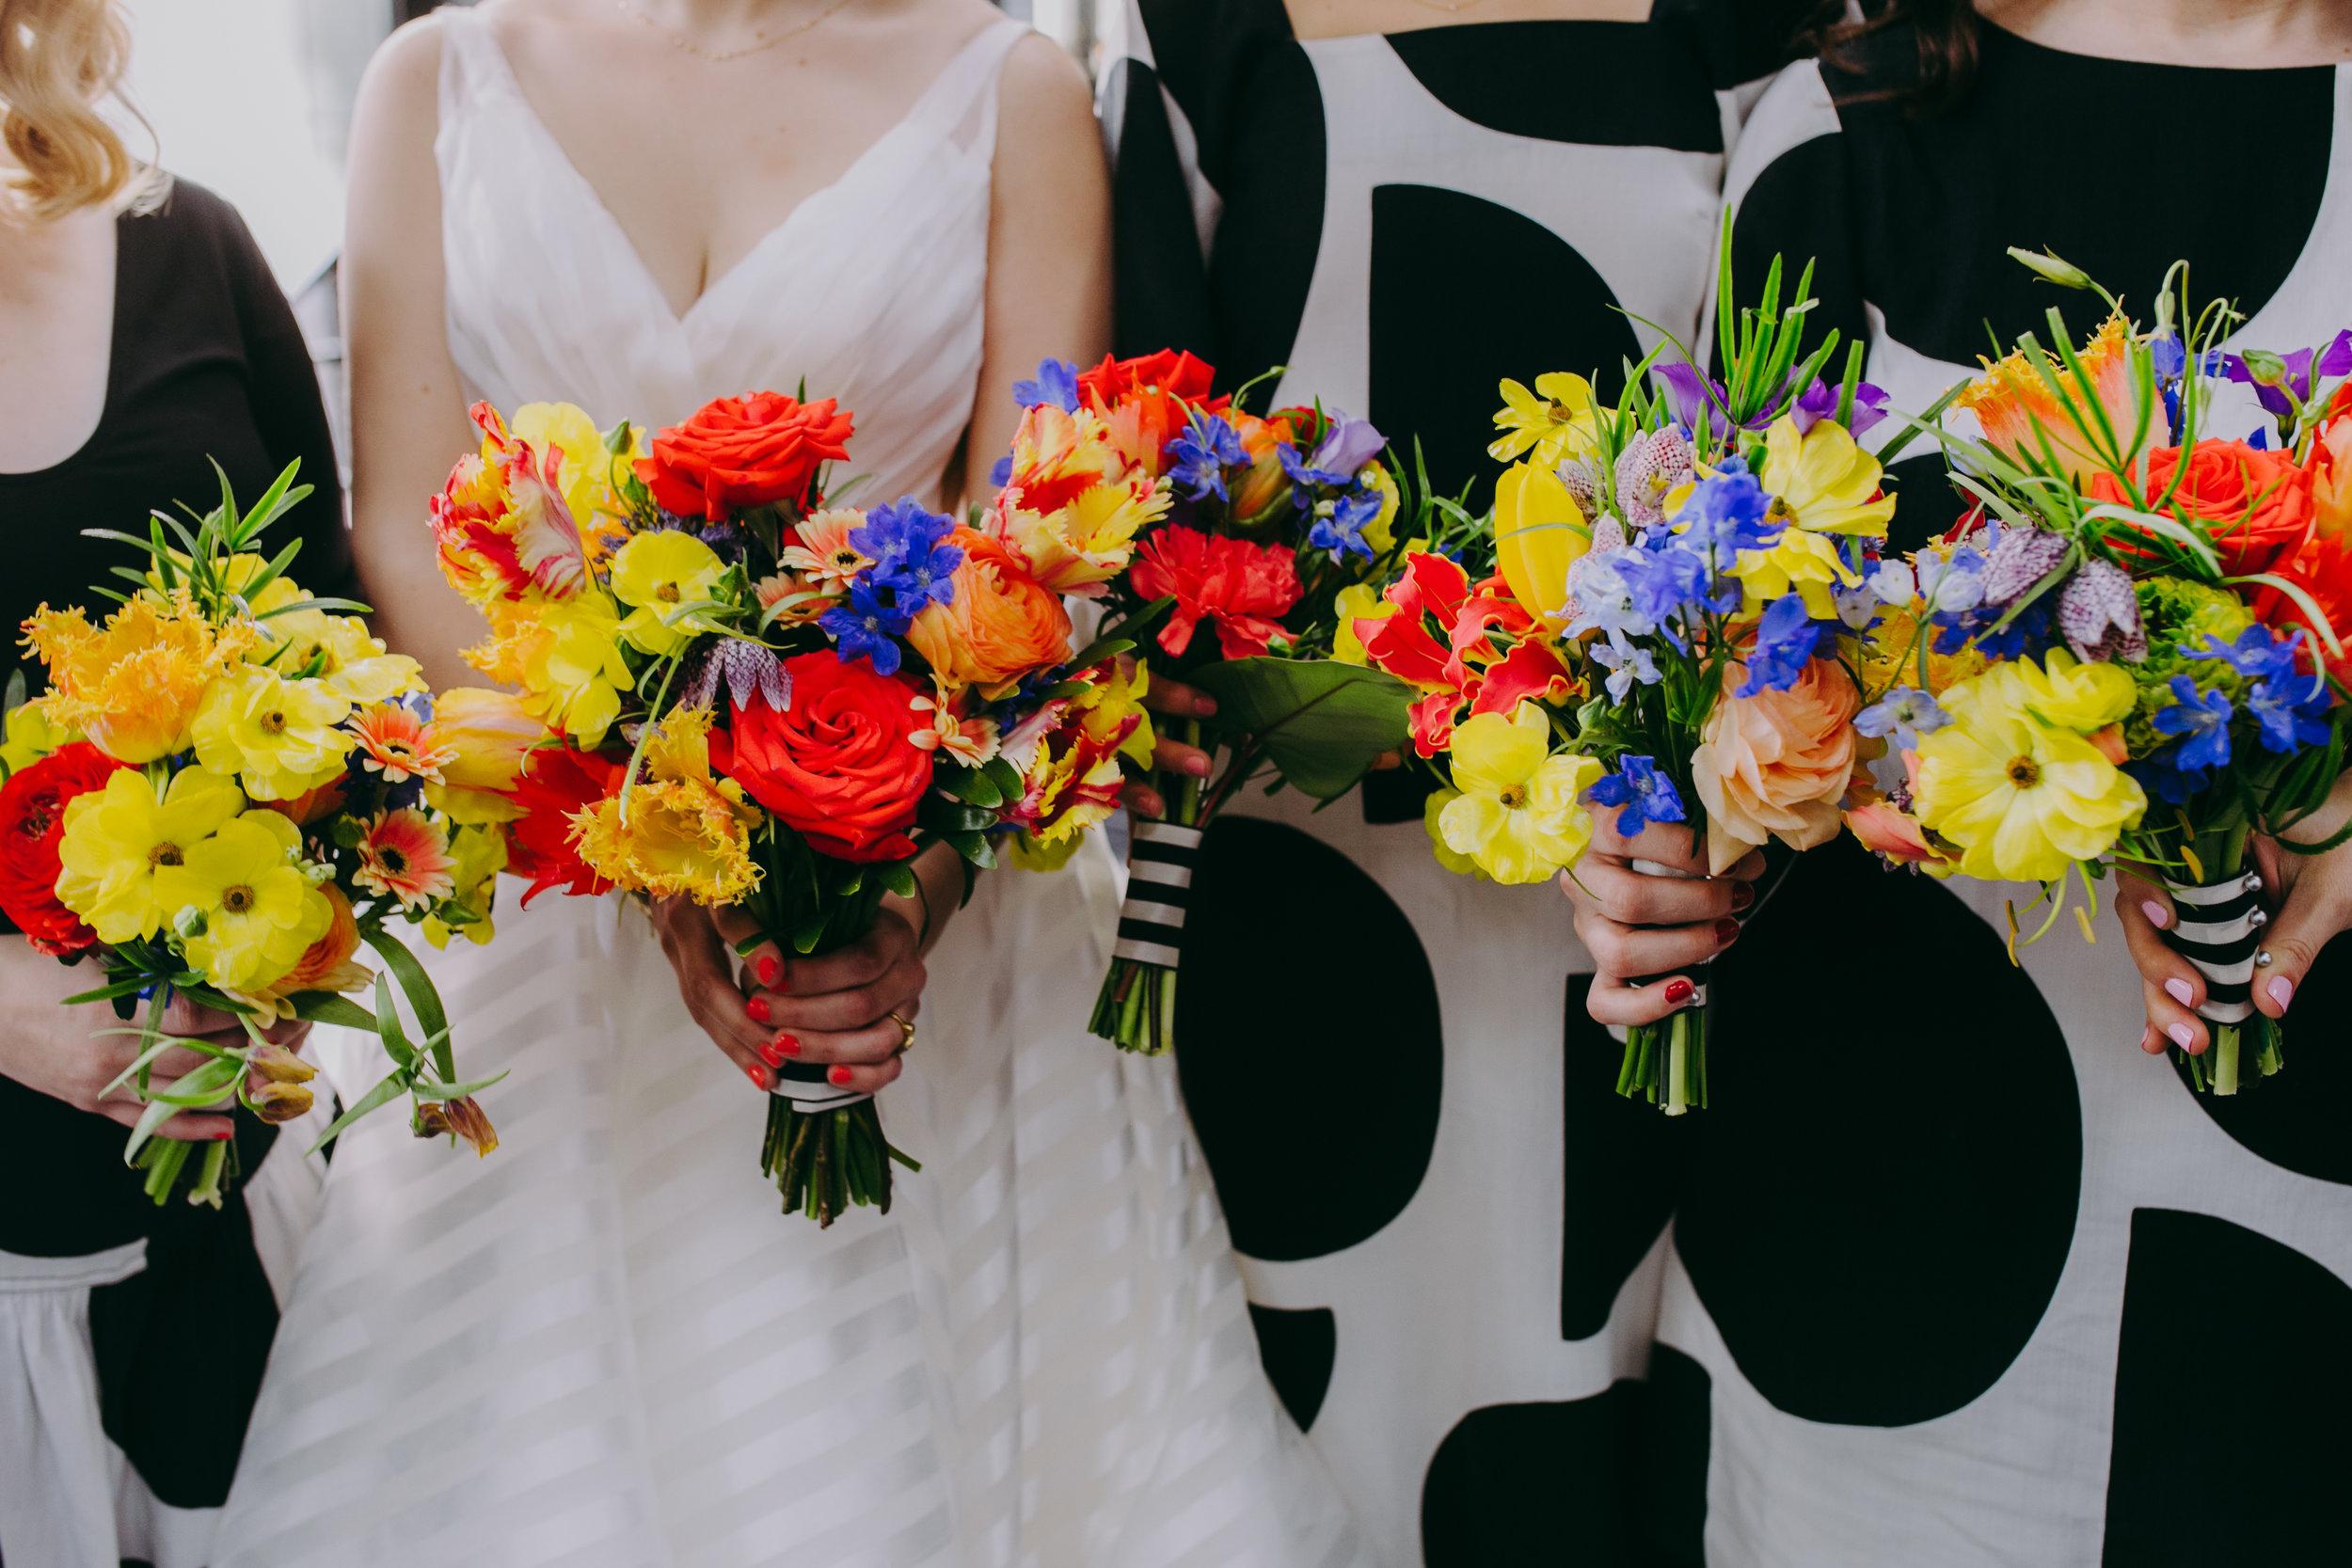 501-union-wedding-photographer-amber-gress-0277.jpg